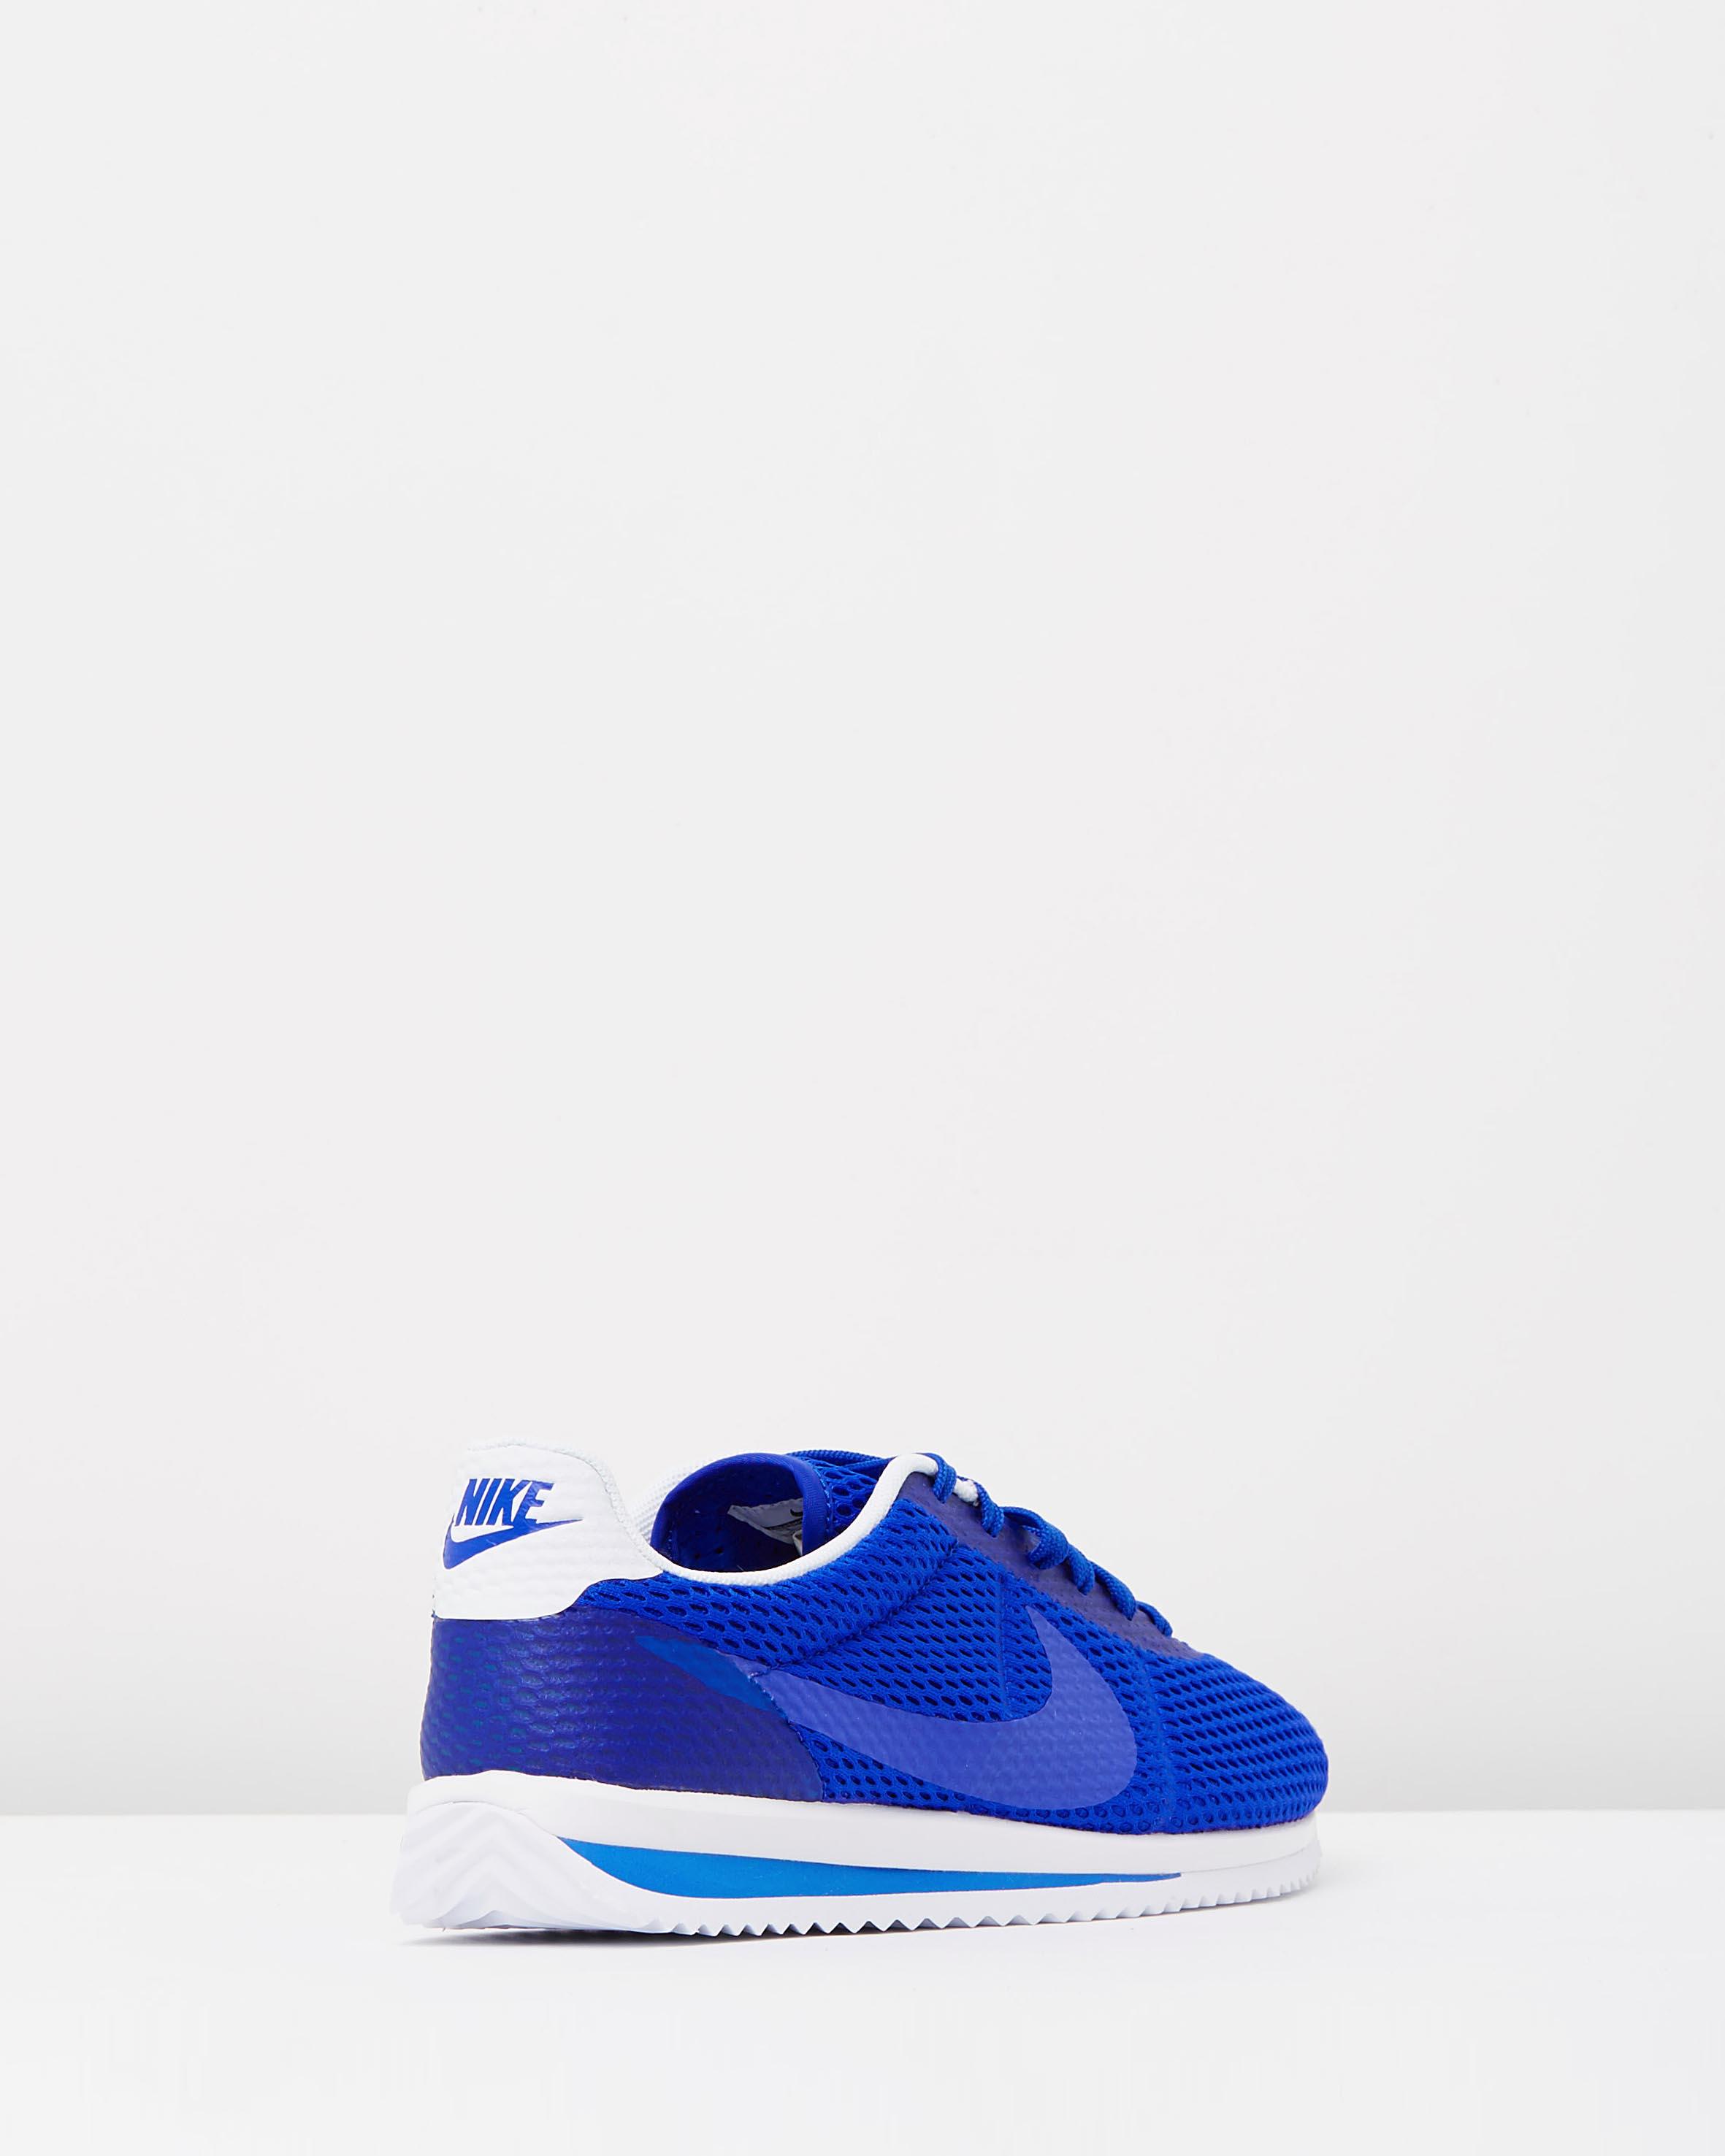 8613c5543a9 ... Nike Cortez Ultra BR Total Blue White 2 ...